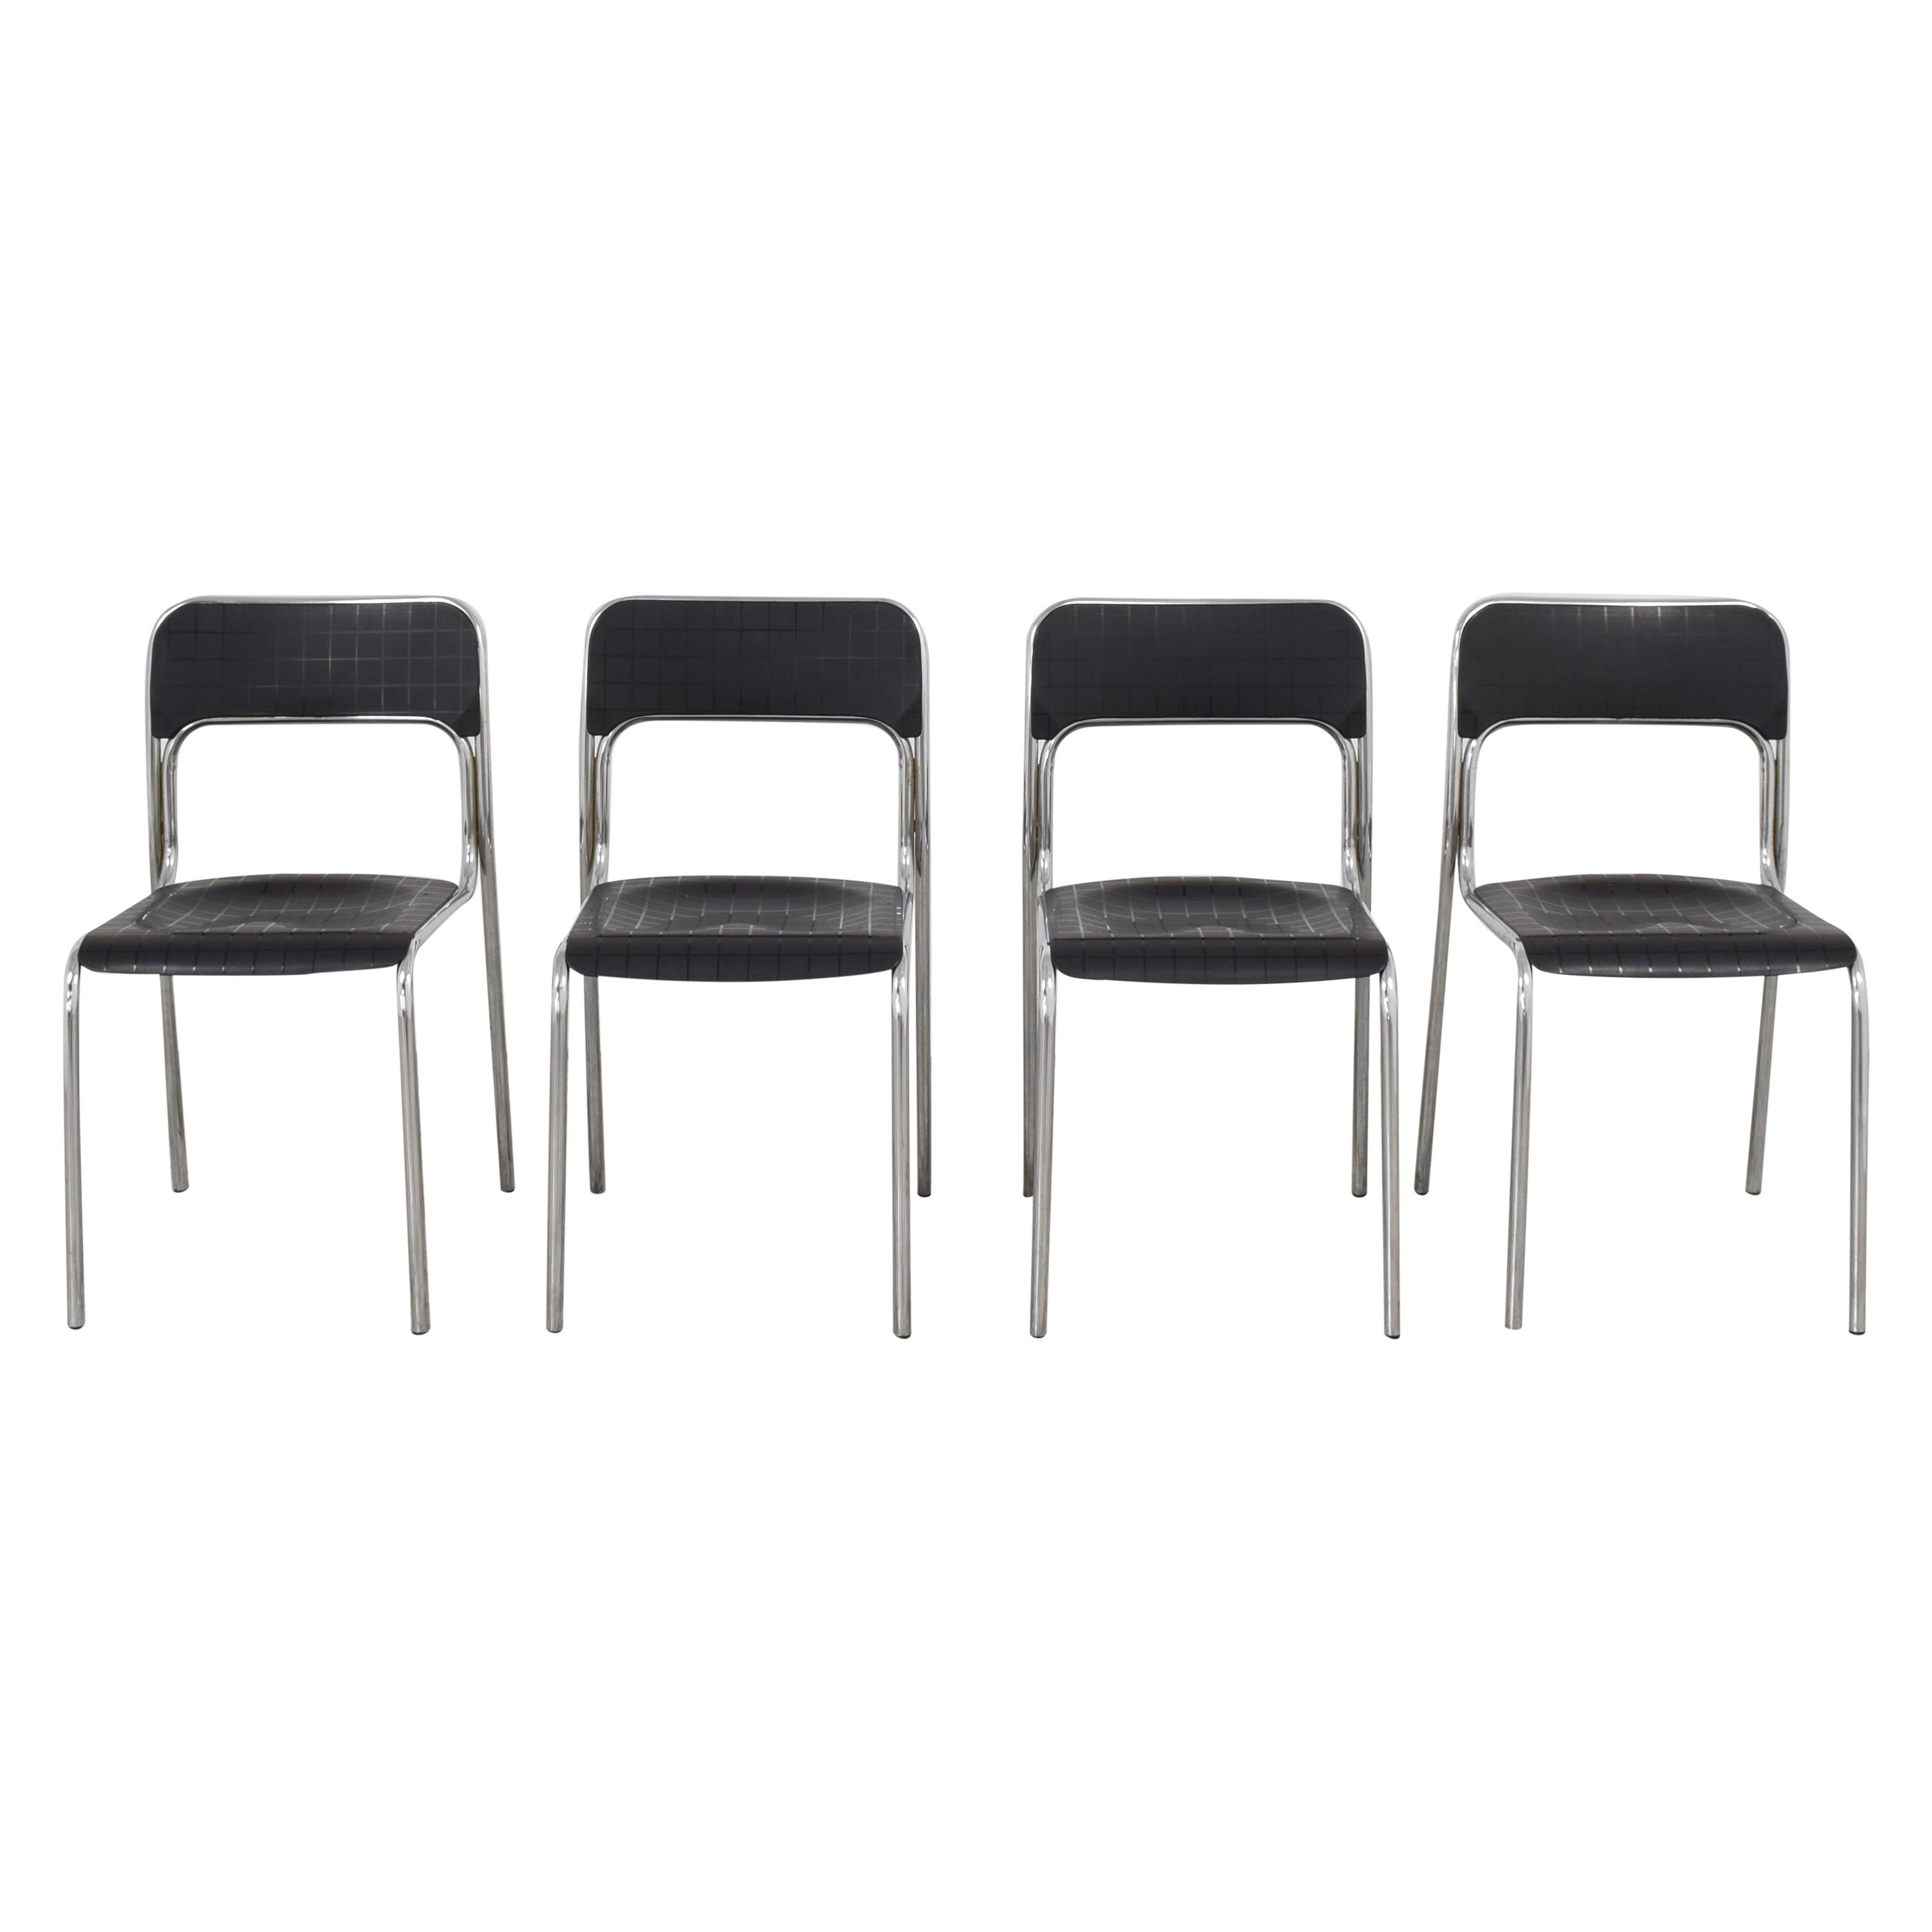 Sintesi Sintesi Italian Dining Chairs dimensions